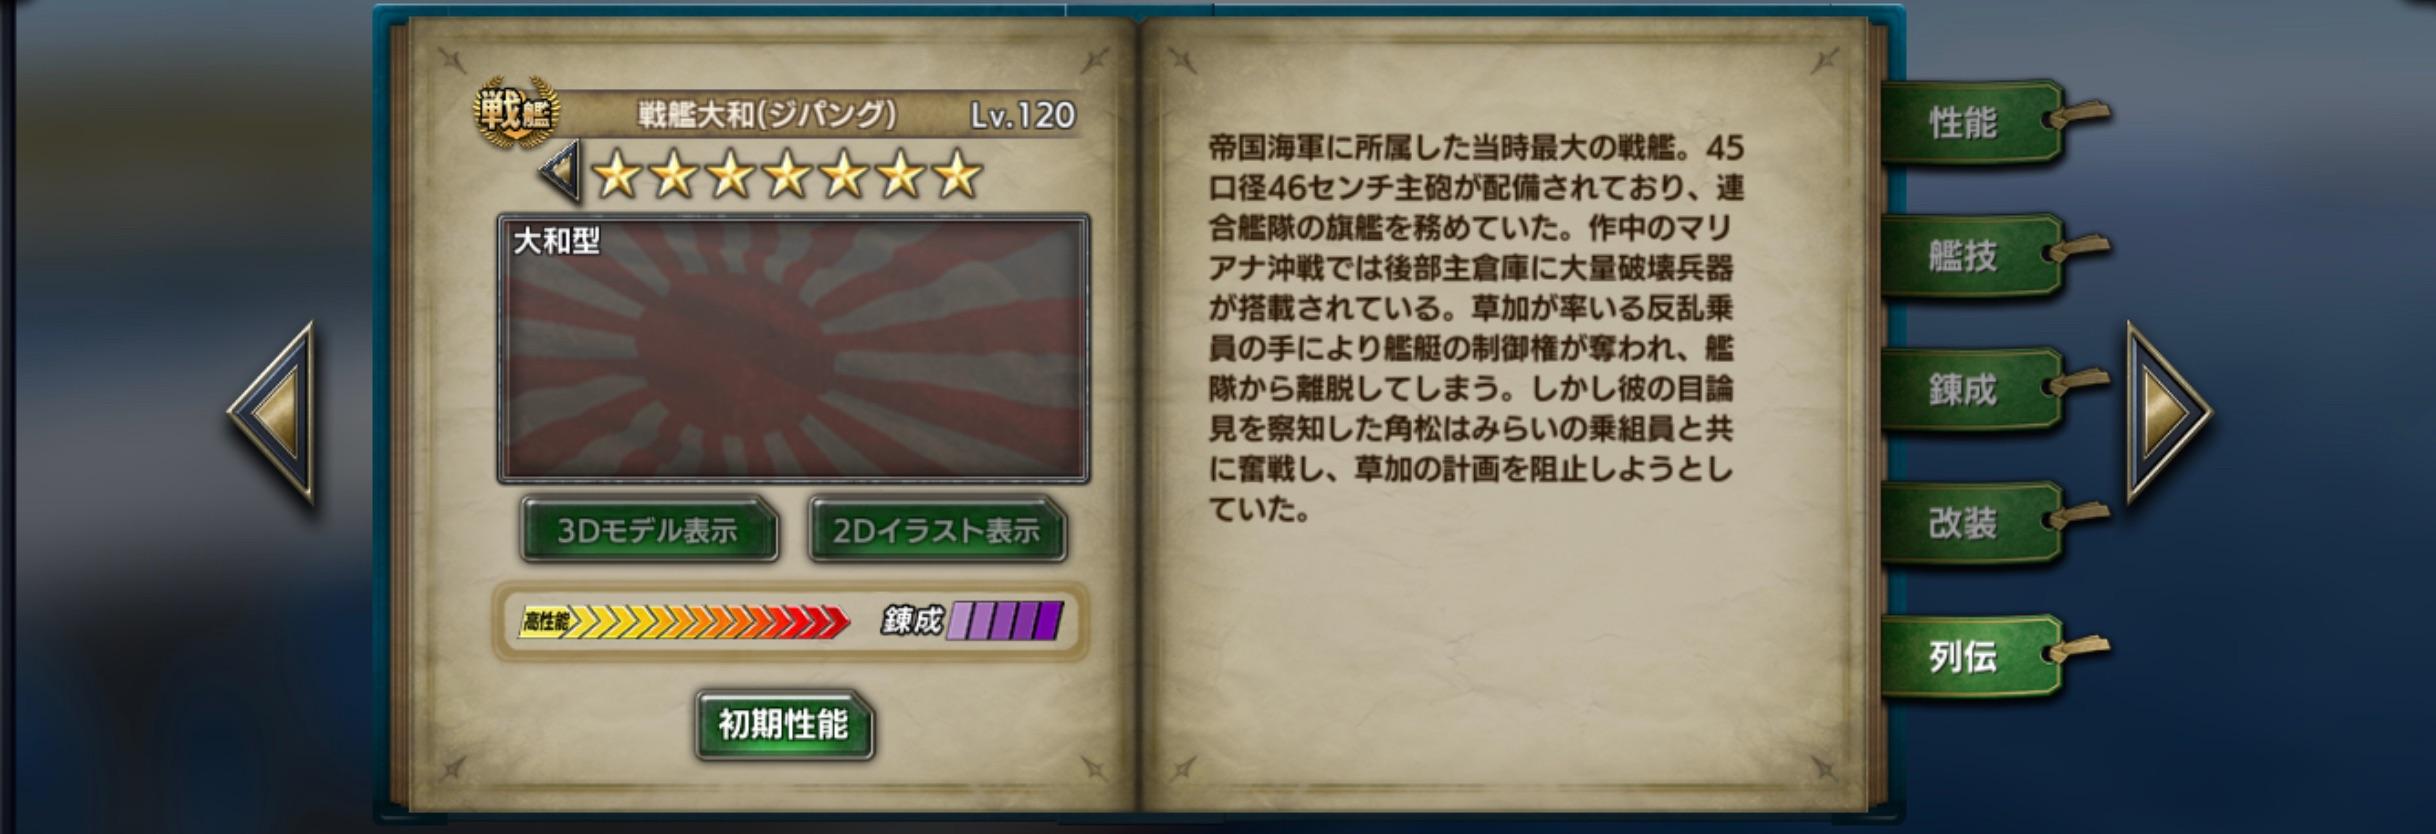 SyamatoJ-history